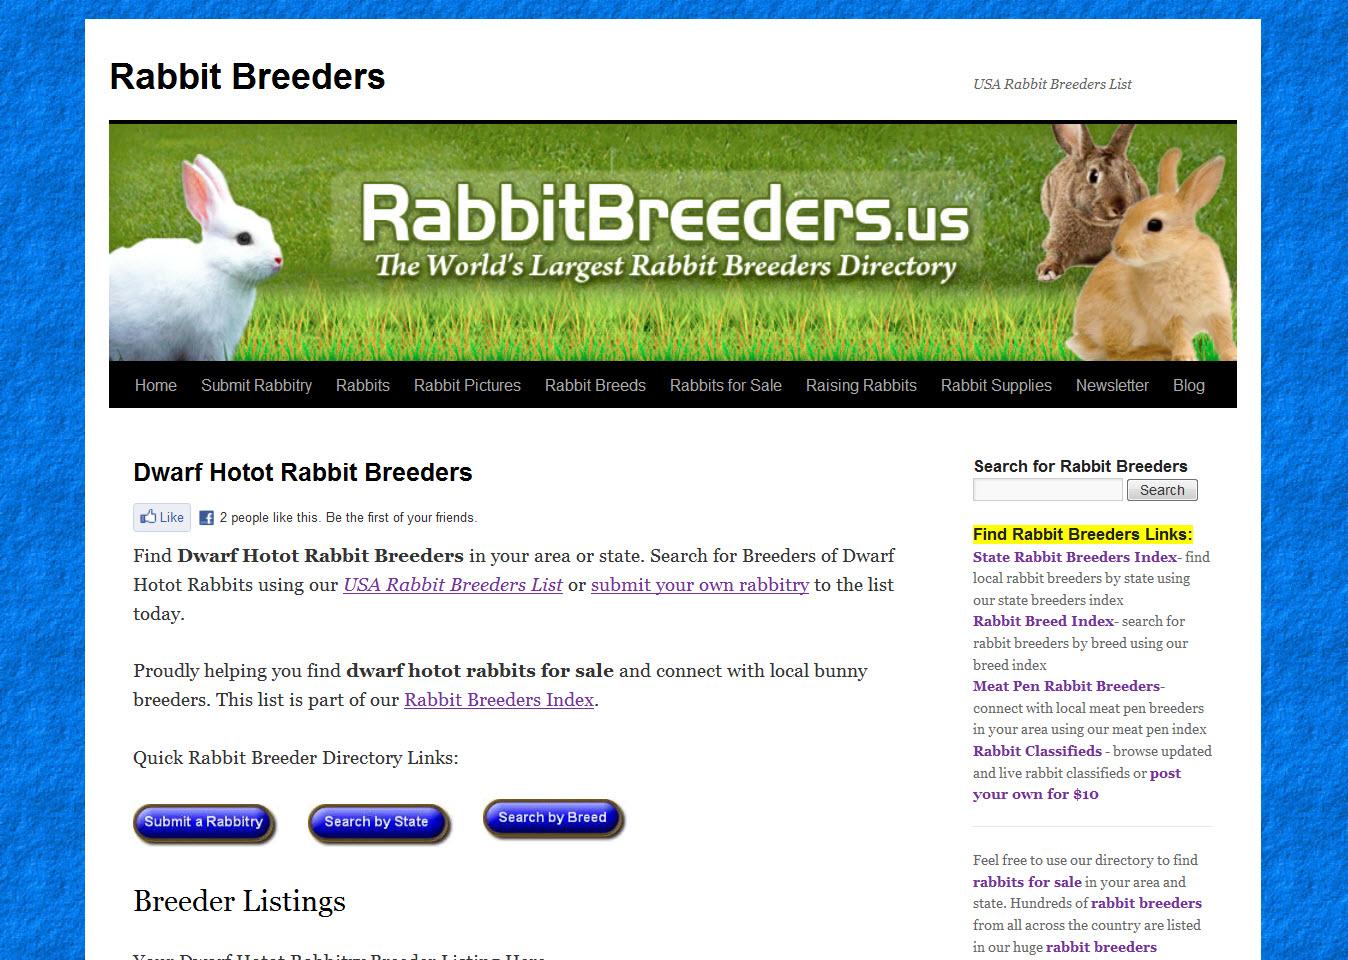 Dwarf Hotot Rabbit Breeders